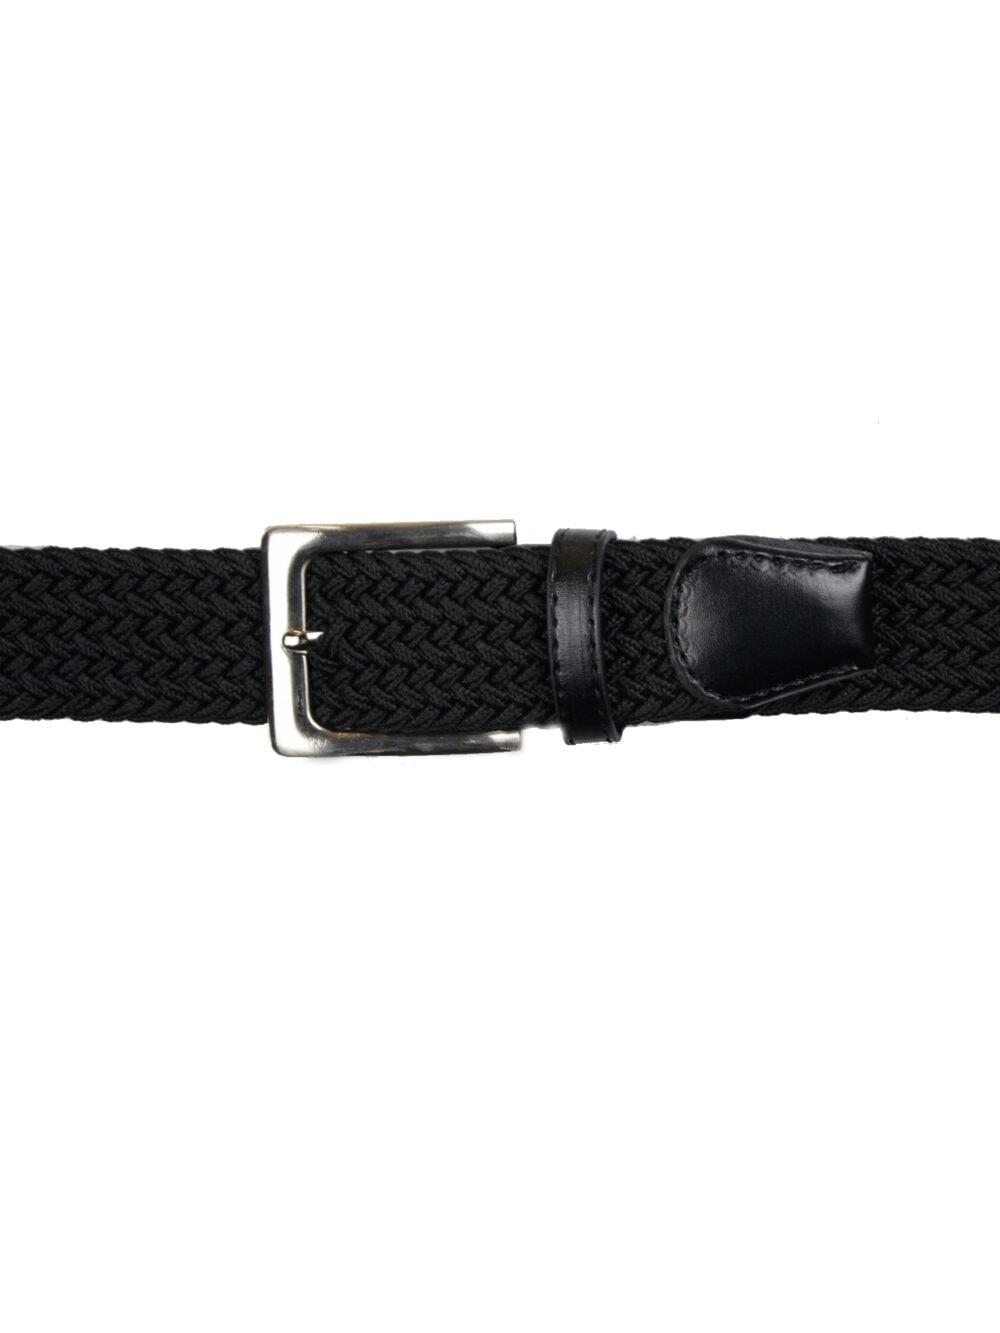 Bransholm Elastic Fletbelt 200-003 Black